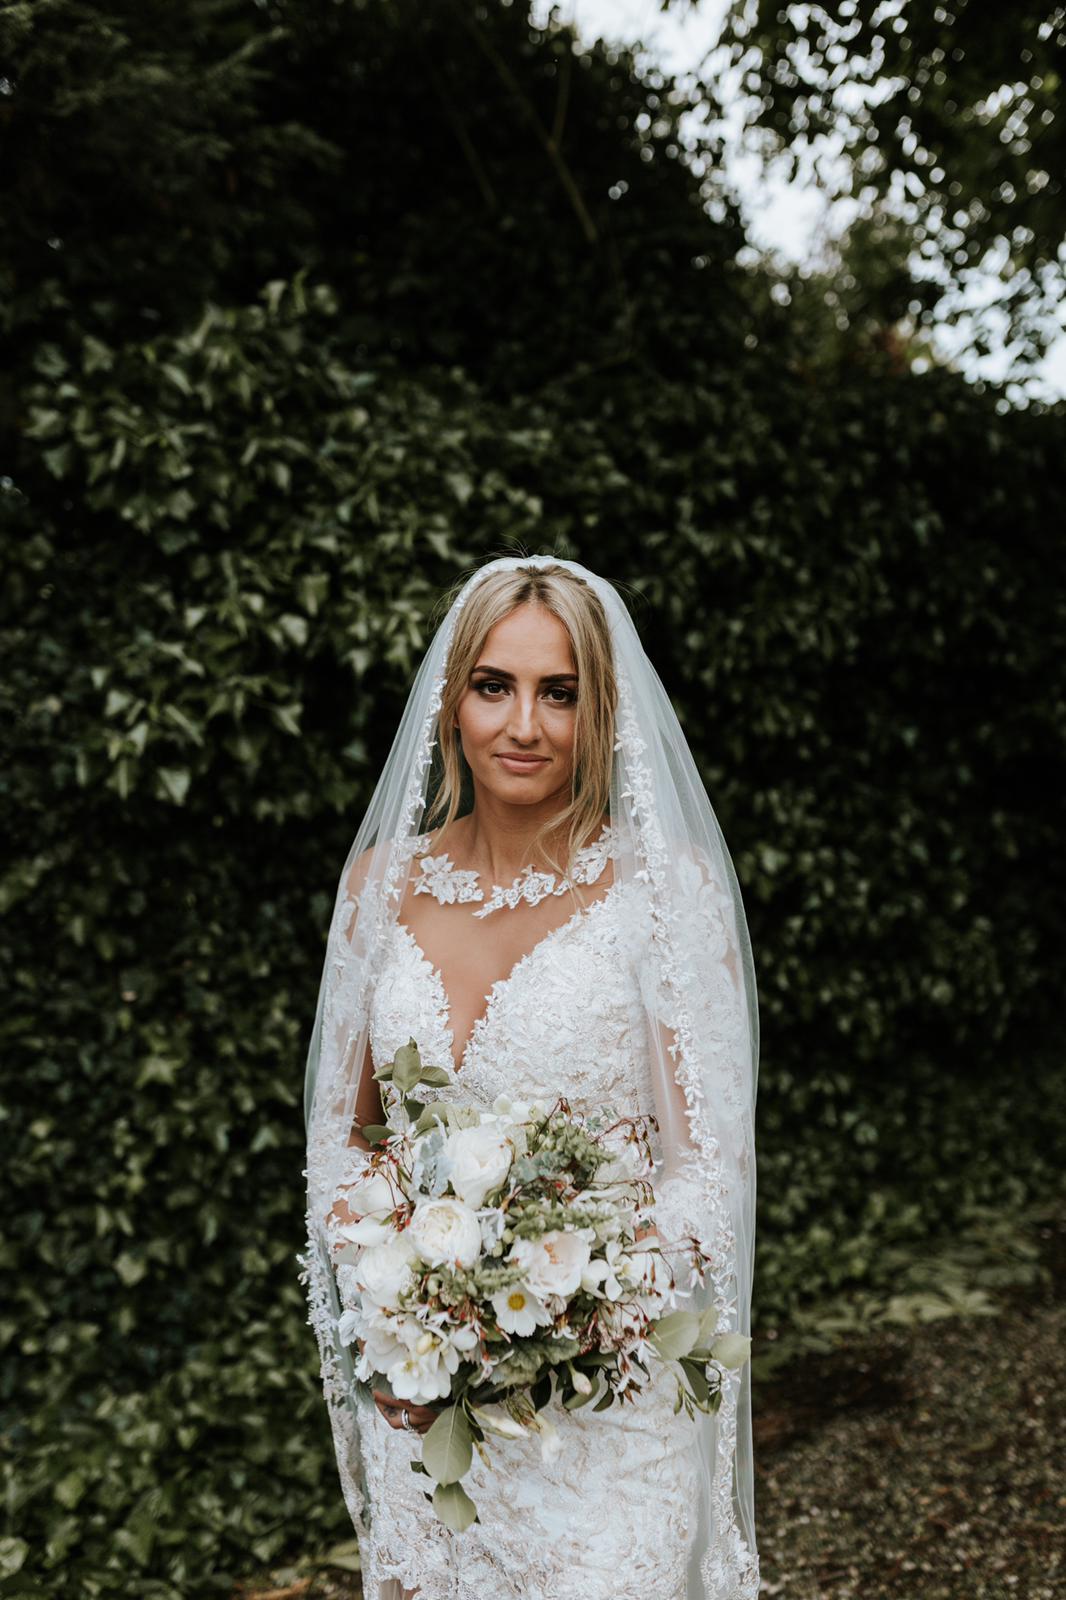 #apbloem #florist #bloemist #amsterdam #bloemenwinkel #kerkstraat #bloemen #flowers #weddingstyling #bruiloft #trouwen #liefde #bride #wedding #marriage #bruidsboeket #floraldesign #mordernwedding #modernbride #greenhouse #kas #planten #styling #interiorstyling #white #wit #bruid